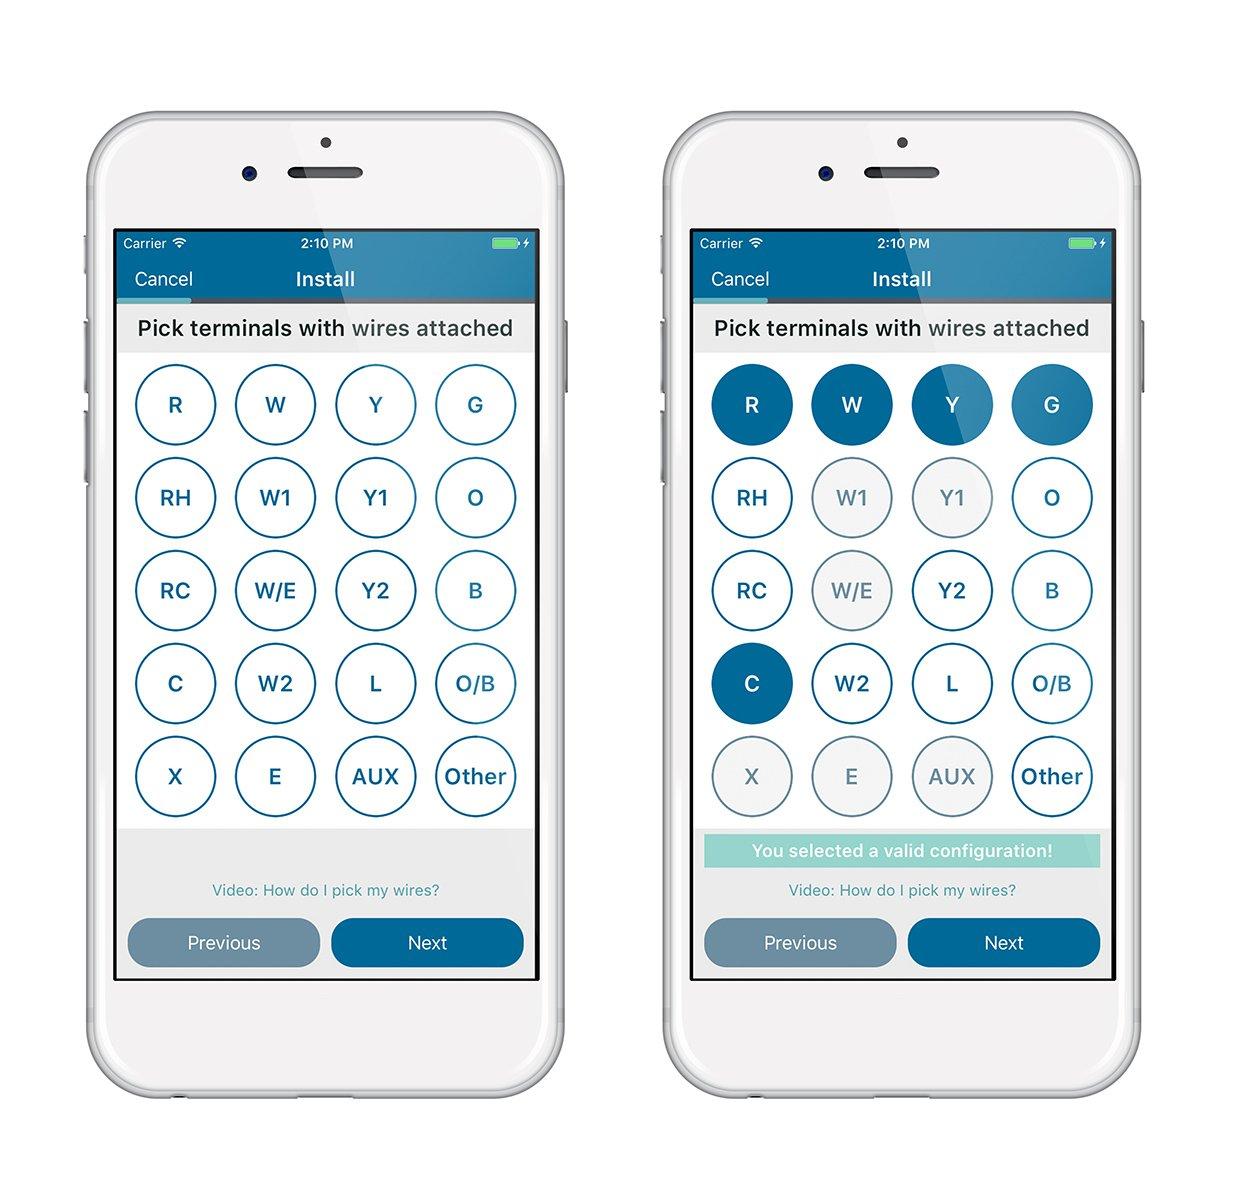 Sensi Wi-Fi Programmable Thermostat, 1F86U-42WF for Smart Home by White-Rodgers: Amazon.es: Bricolaje y herramientas